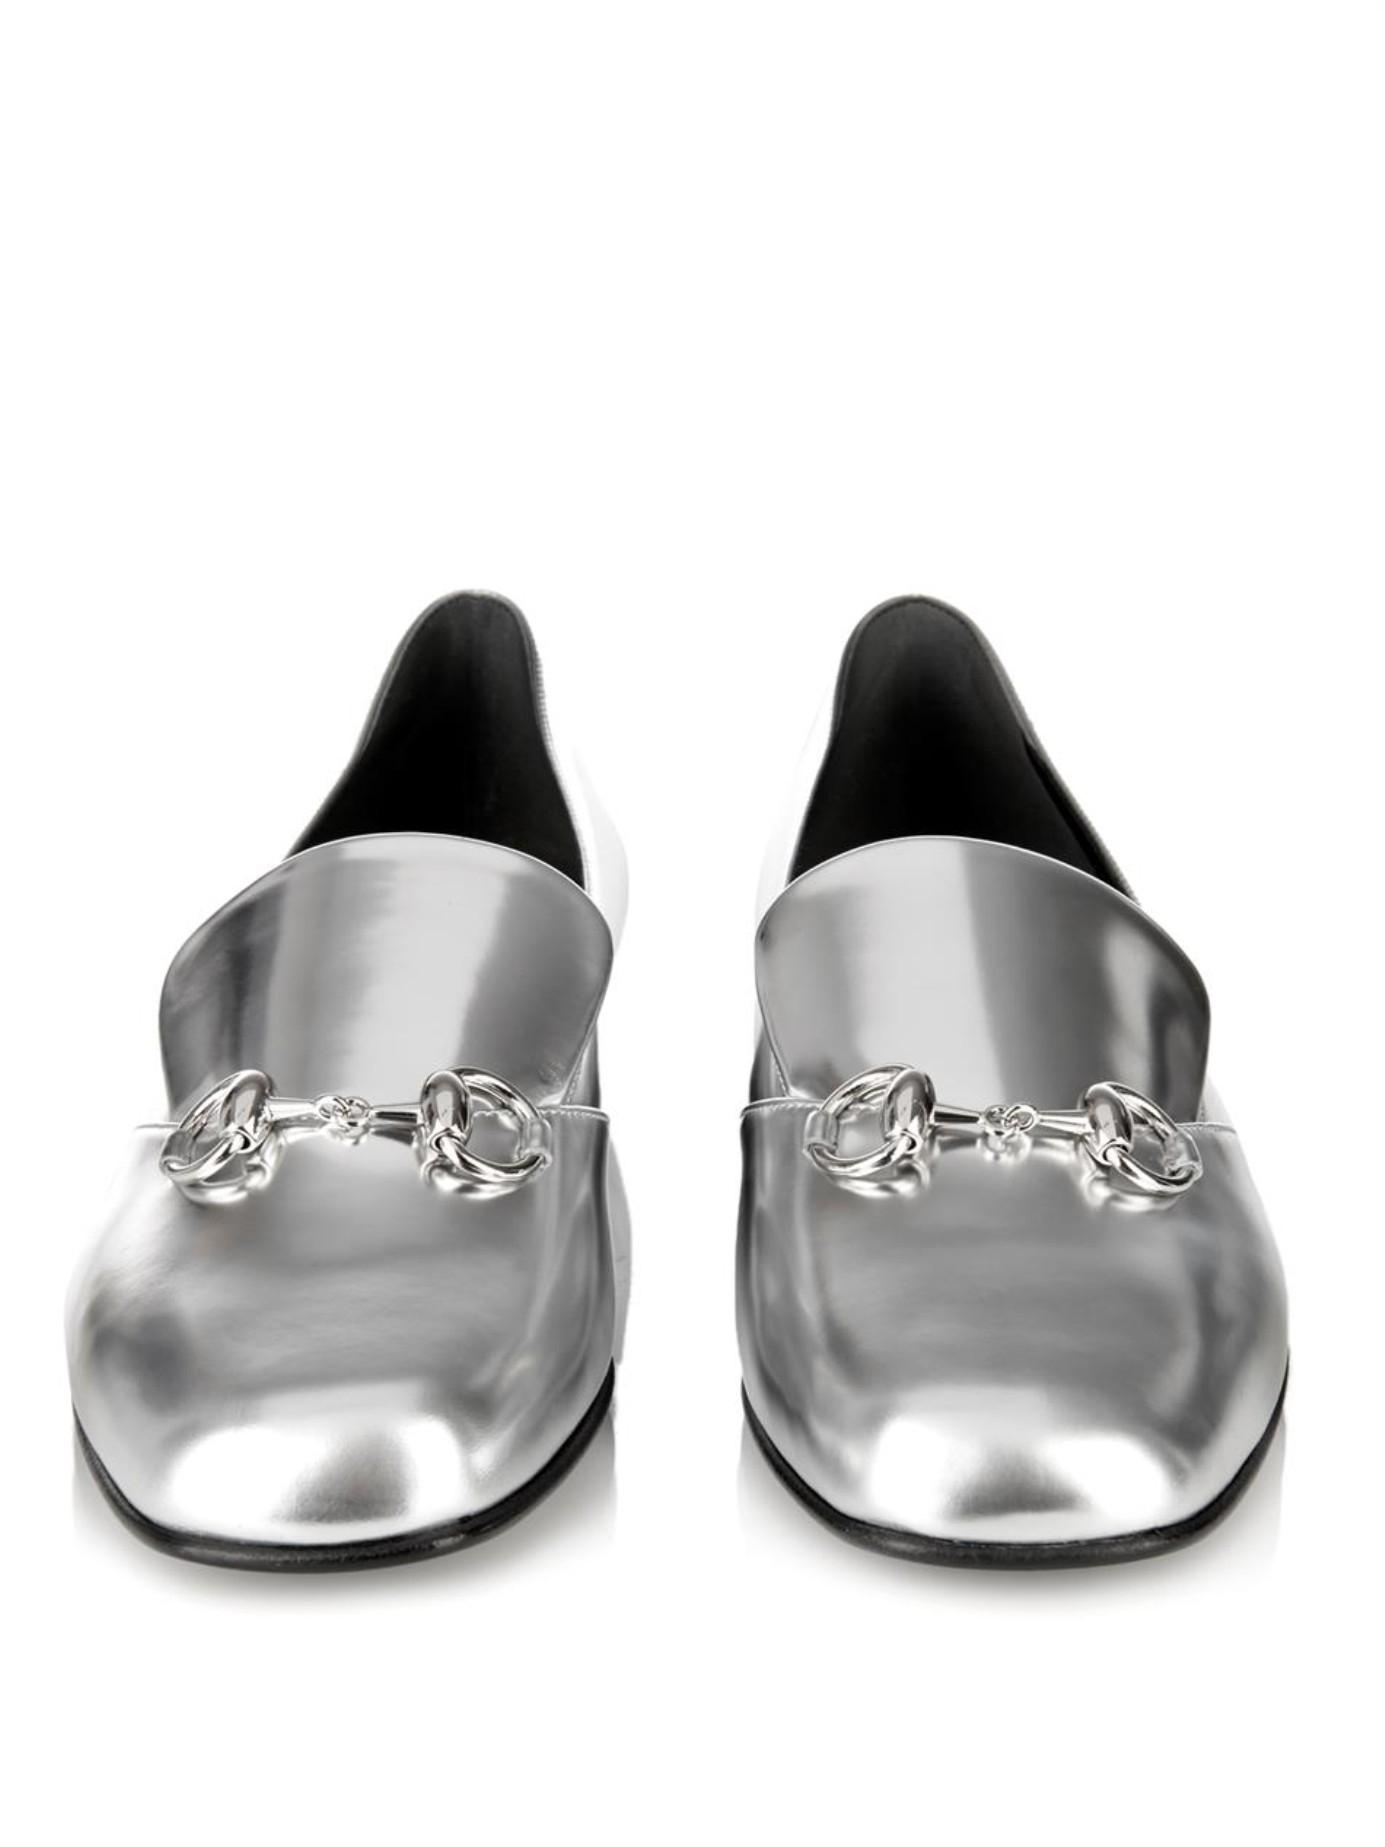 ccb91271556 Lyst - Gucci Kira Leather Horsebit Loafers in Metallic